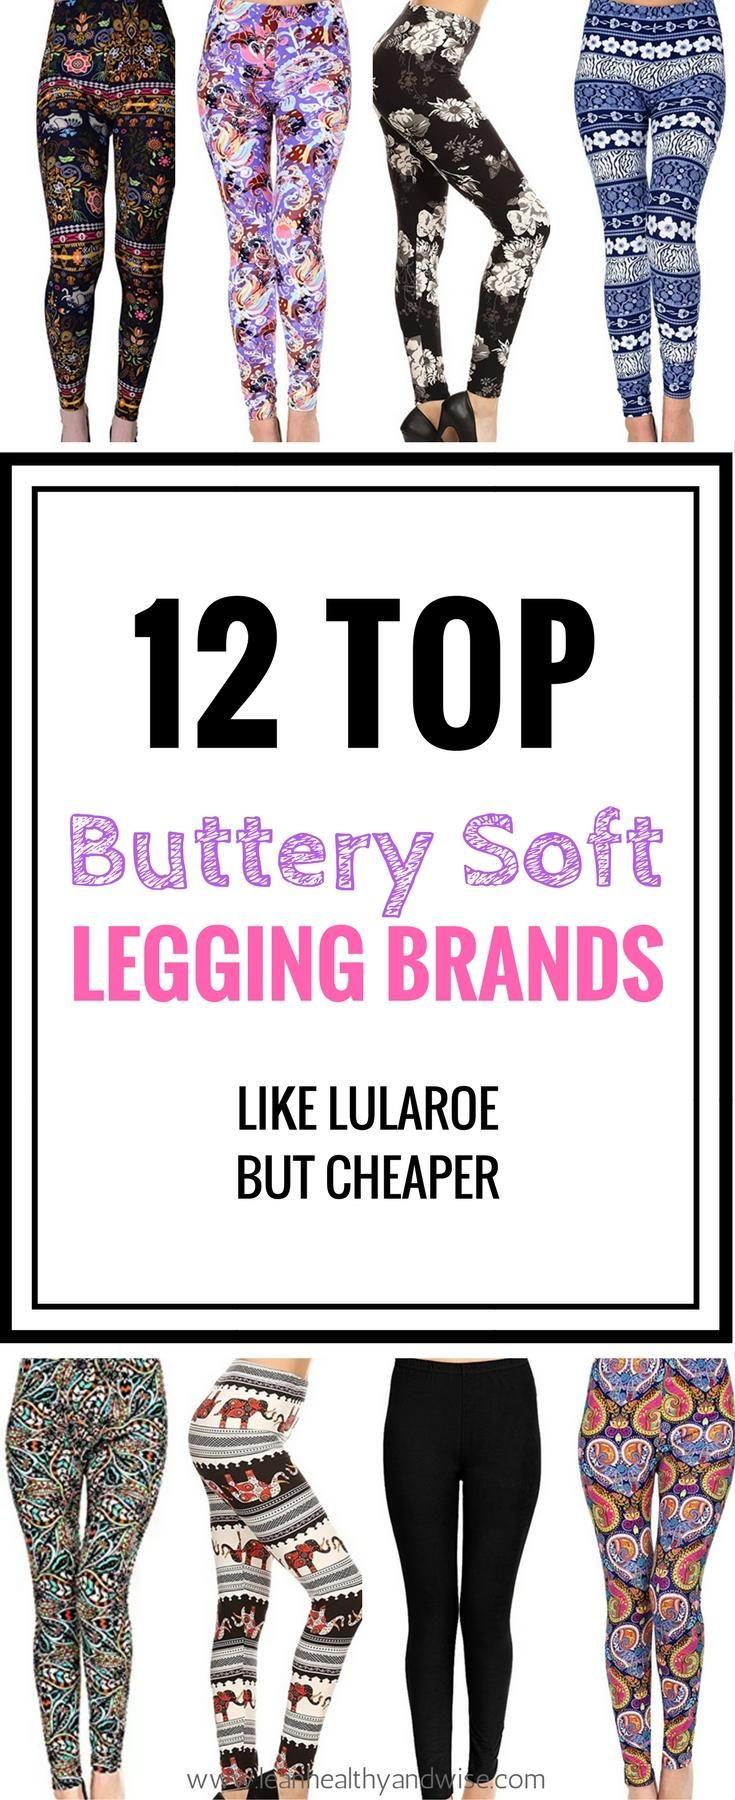 546544423c3b9 Top 12 Buttery Soft Legging Brands like LuLaRoe but Cheaper via   leanhealthywise